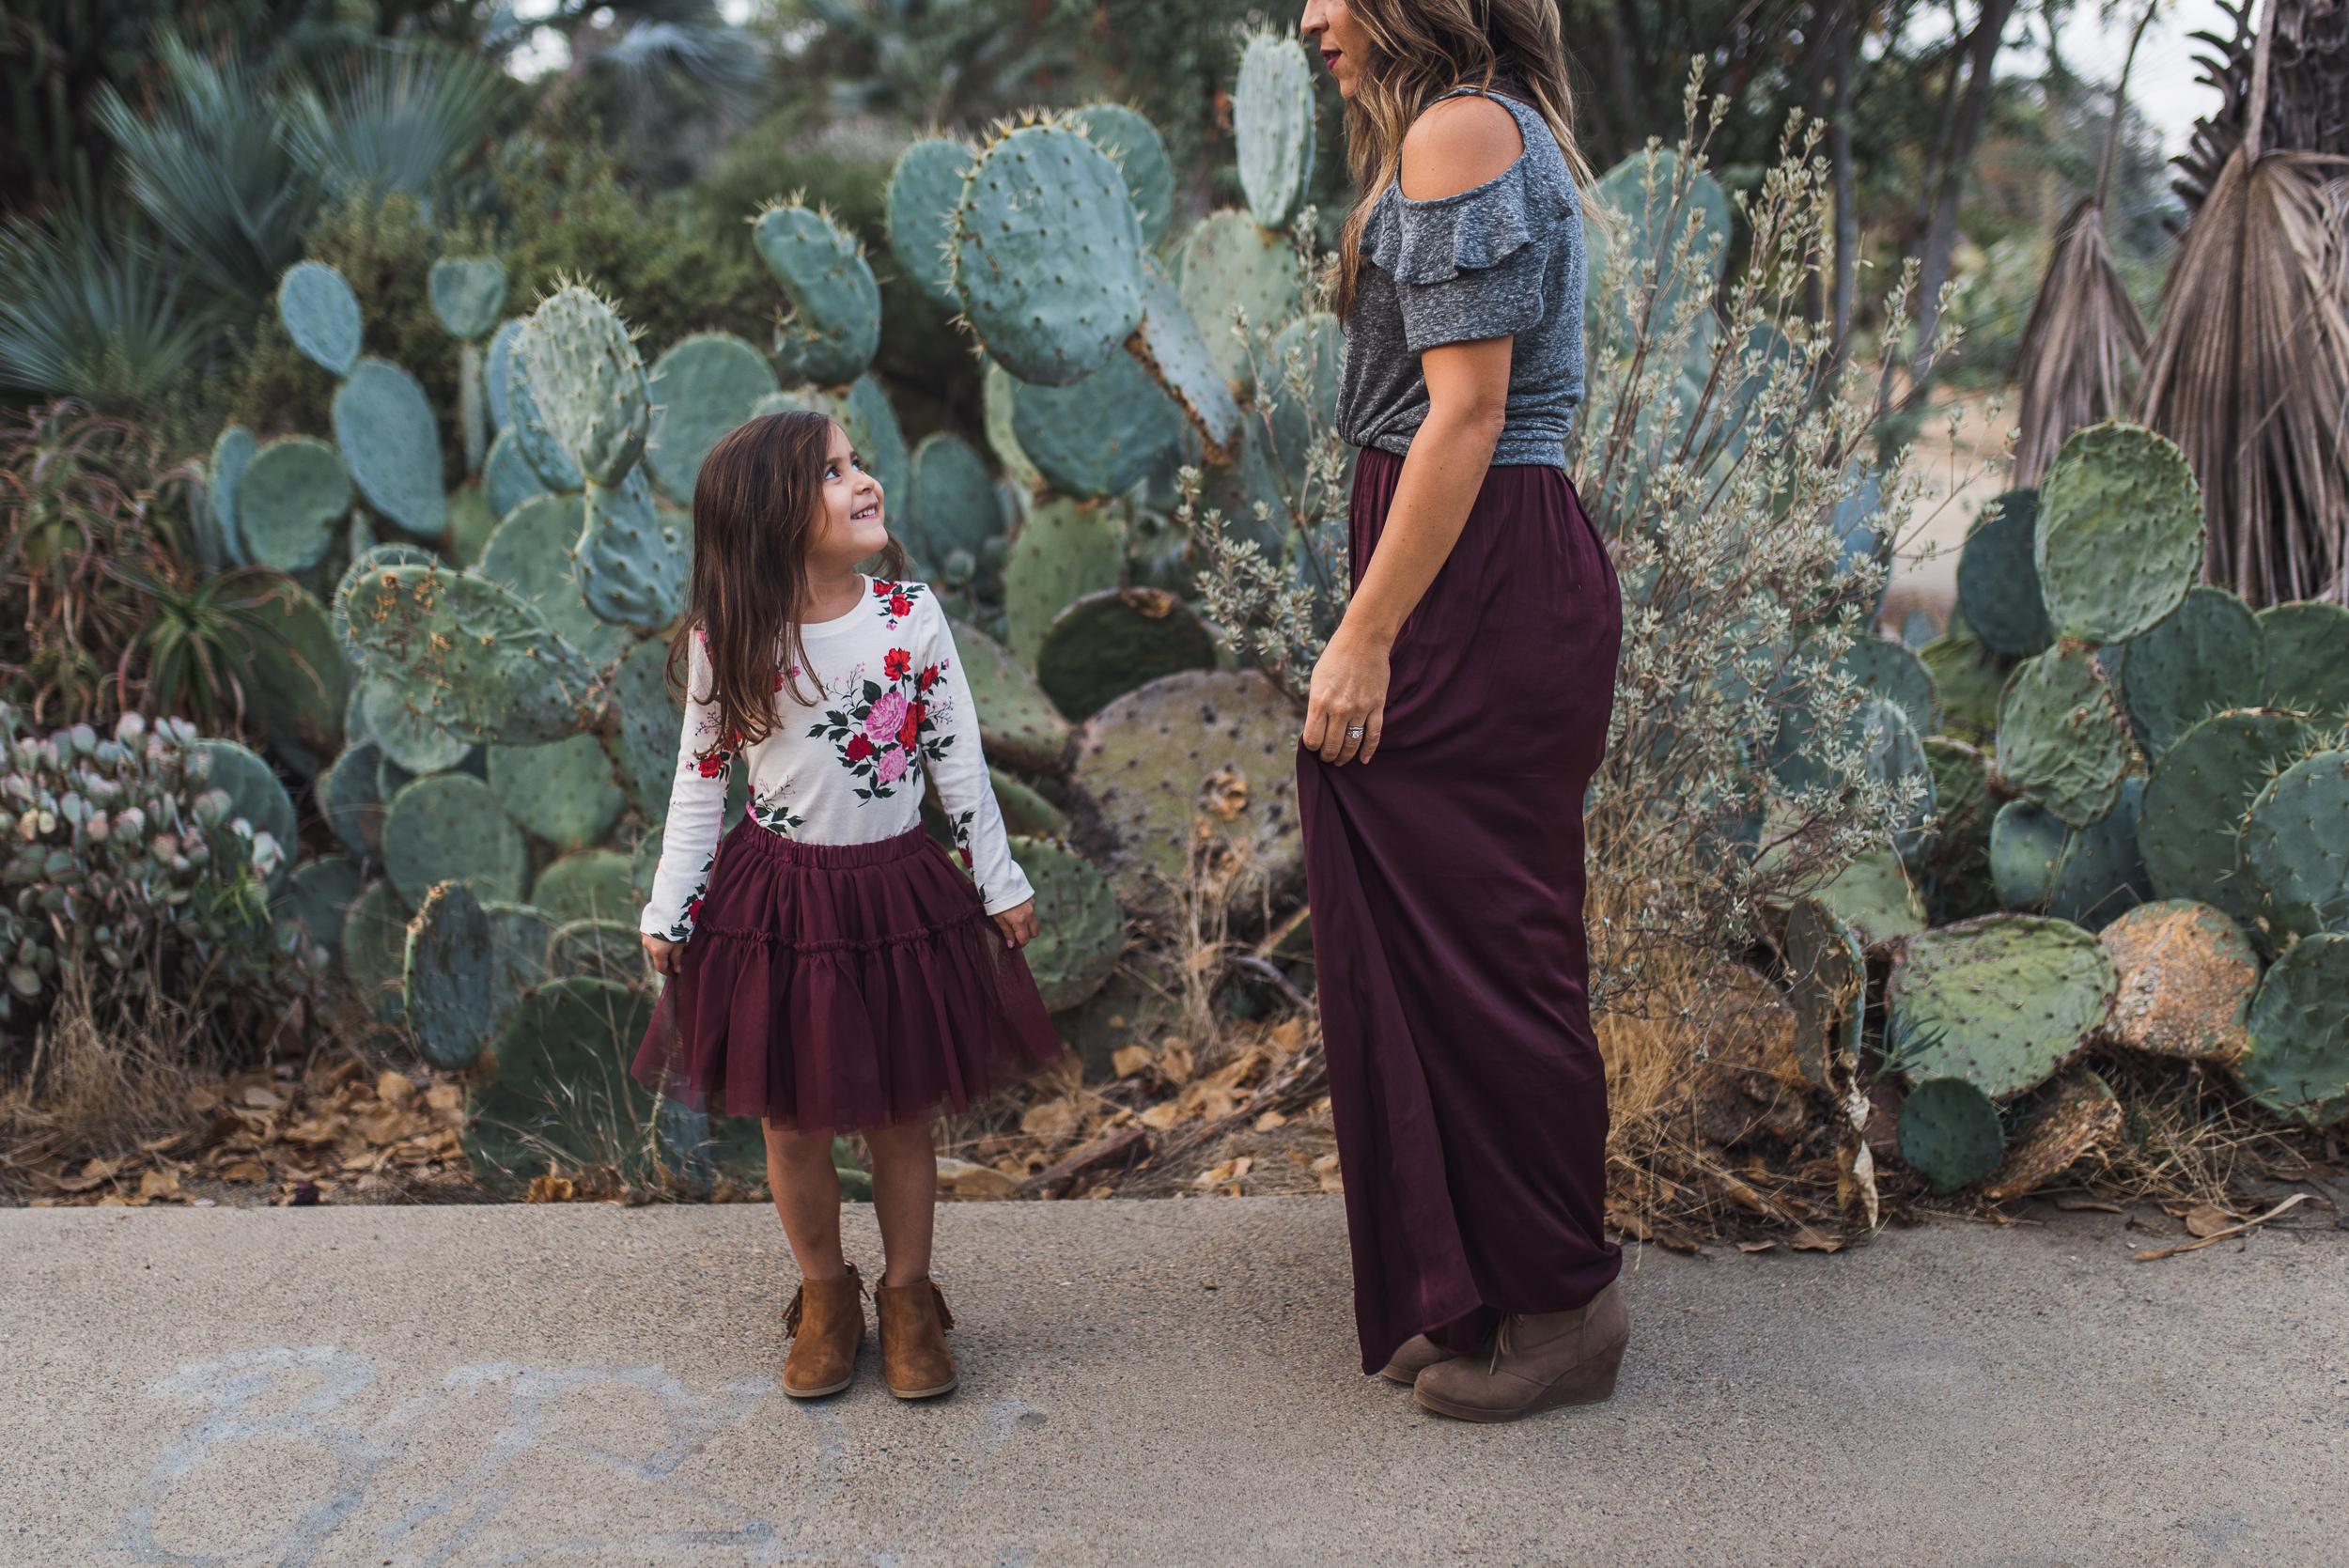 2018-San-Diego-Family-Lifestyle-Newborn-Travel-Vacation-Photographer-Kelsey-Smith-Photography-Coronado-La-Jolla-Encinitas-Solana-Beach-Del-Mar-112.jpg